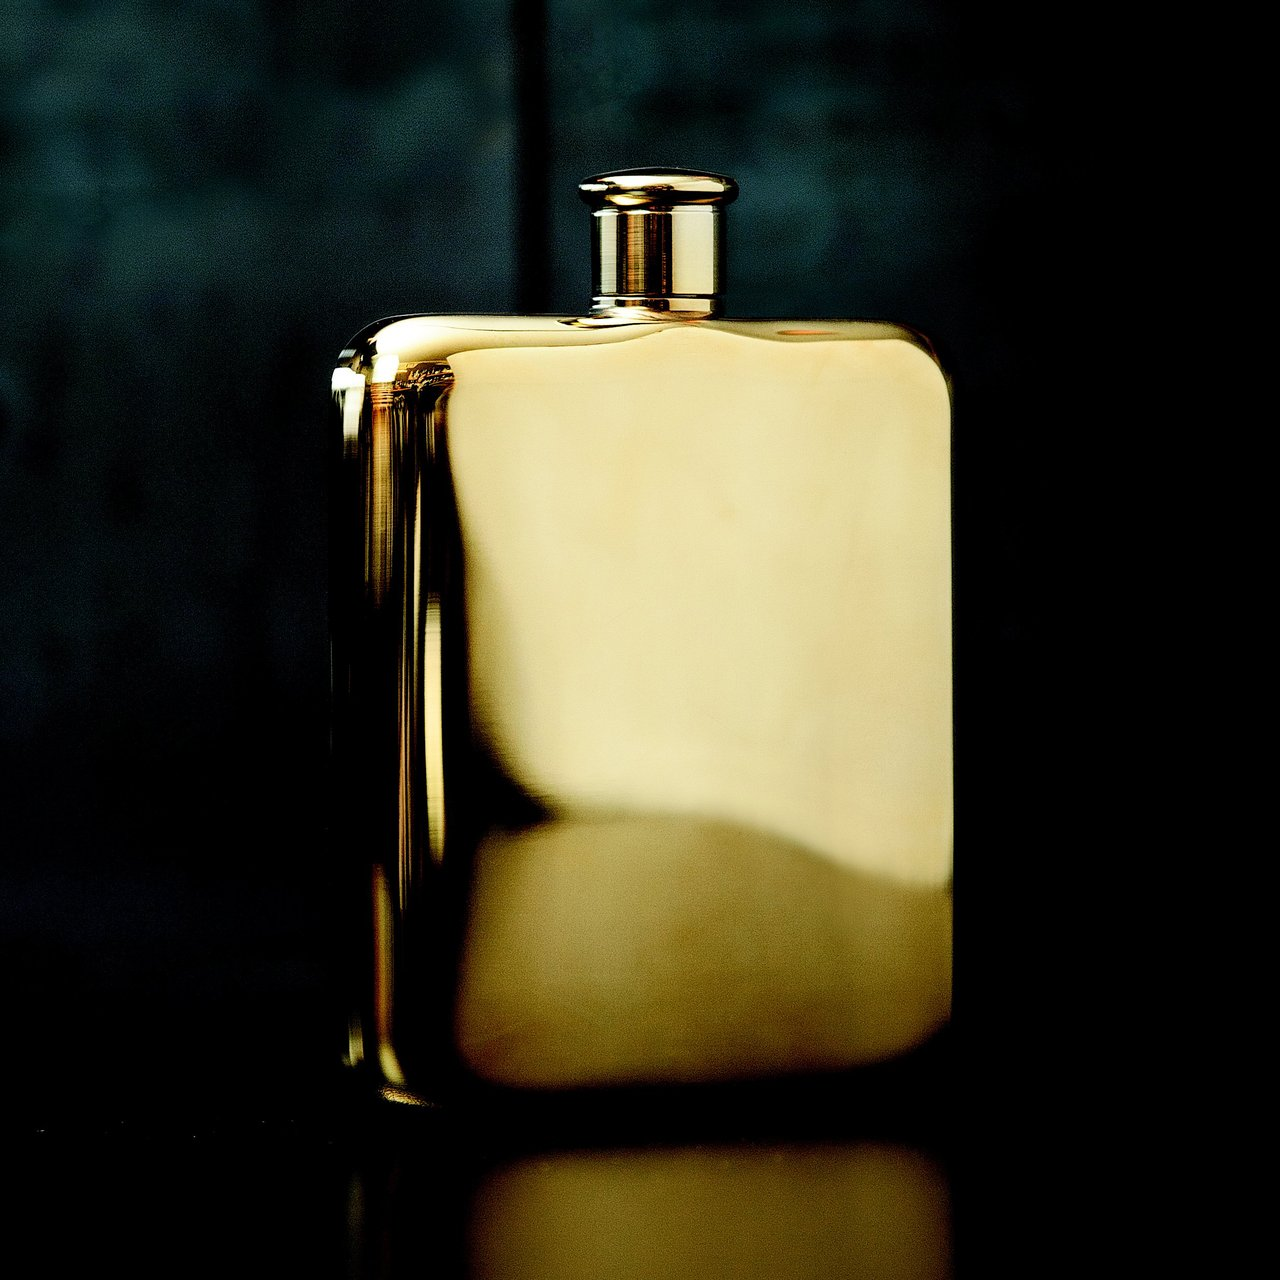 Belmont Gold Plated Flask by Viski